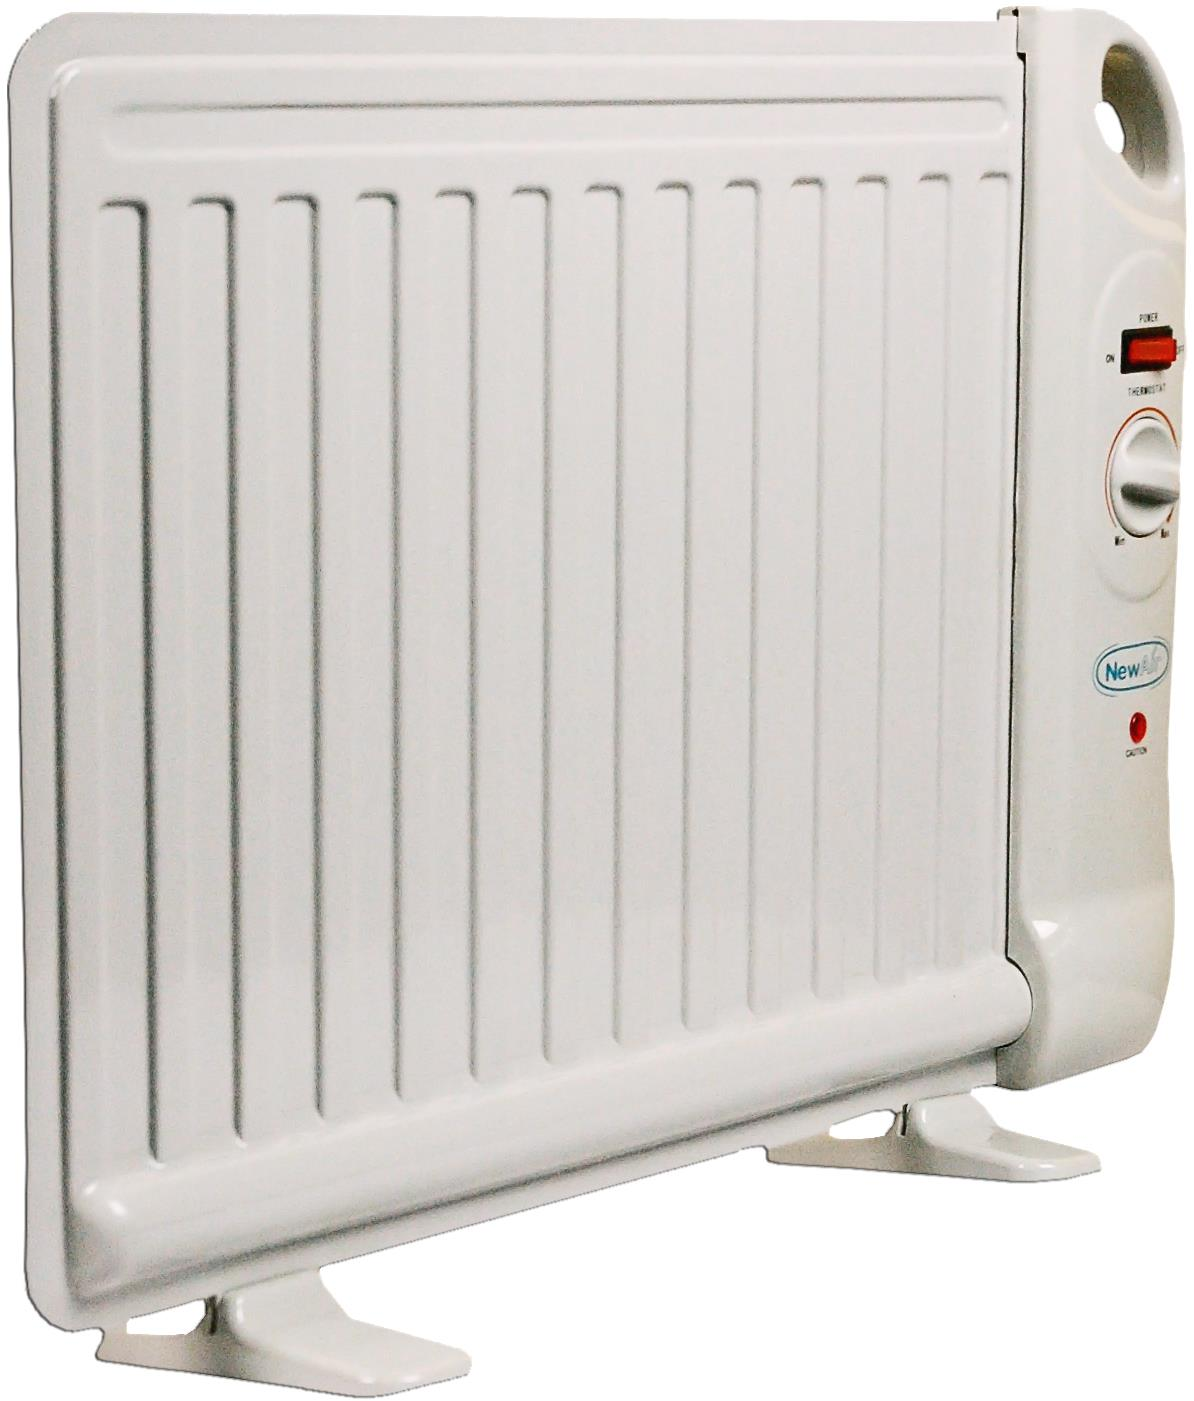 188a6133996 NewAir AH 400 Energy Efficient 400 Watt Oil Filled Personal Space Heater